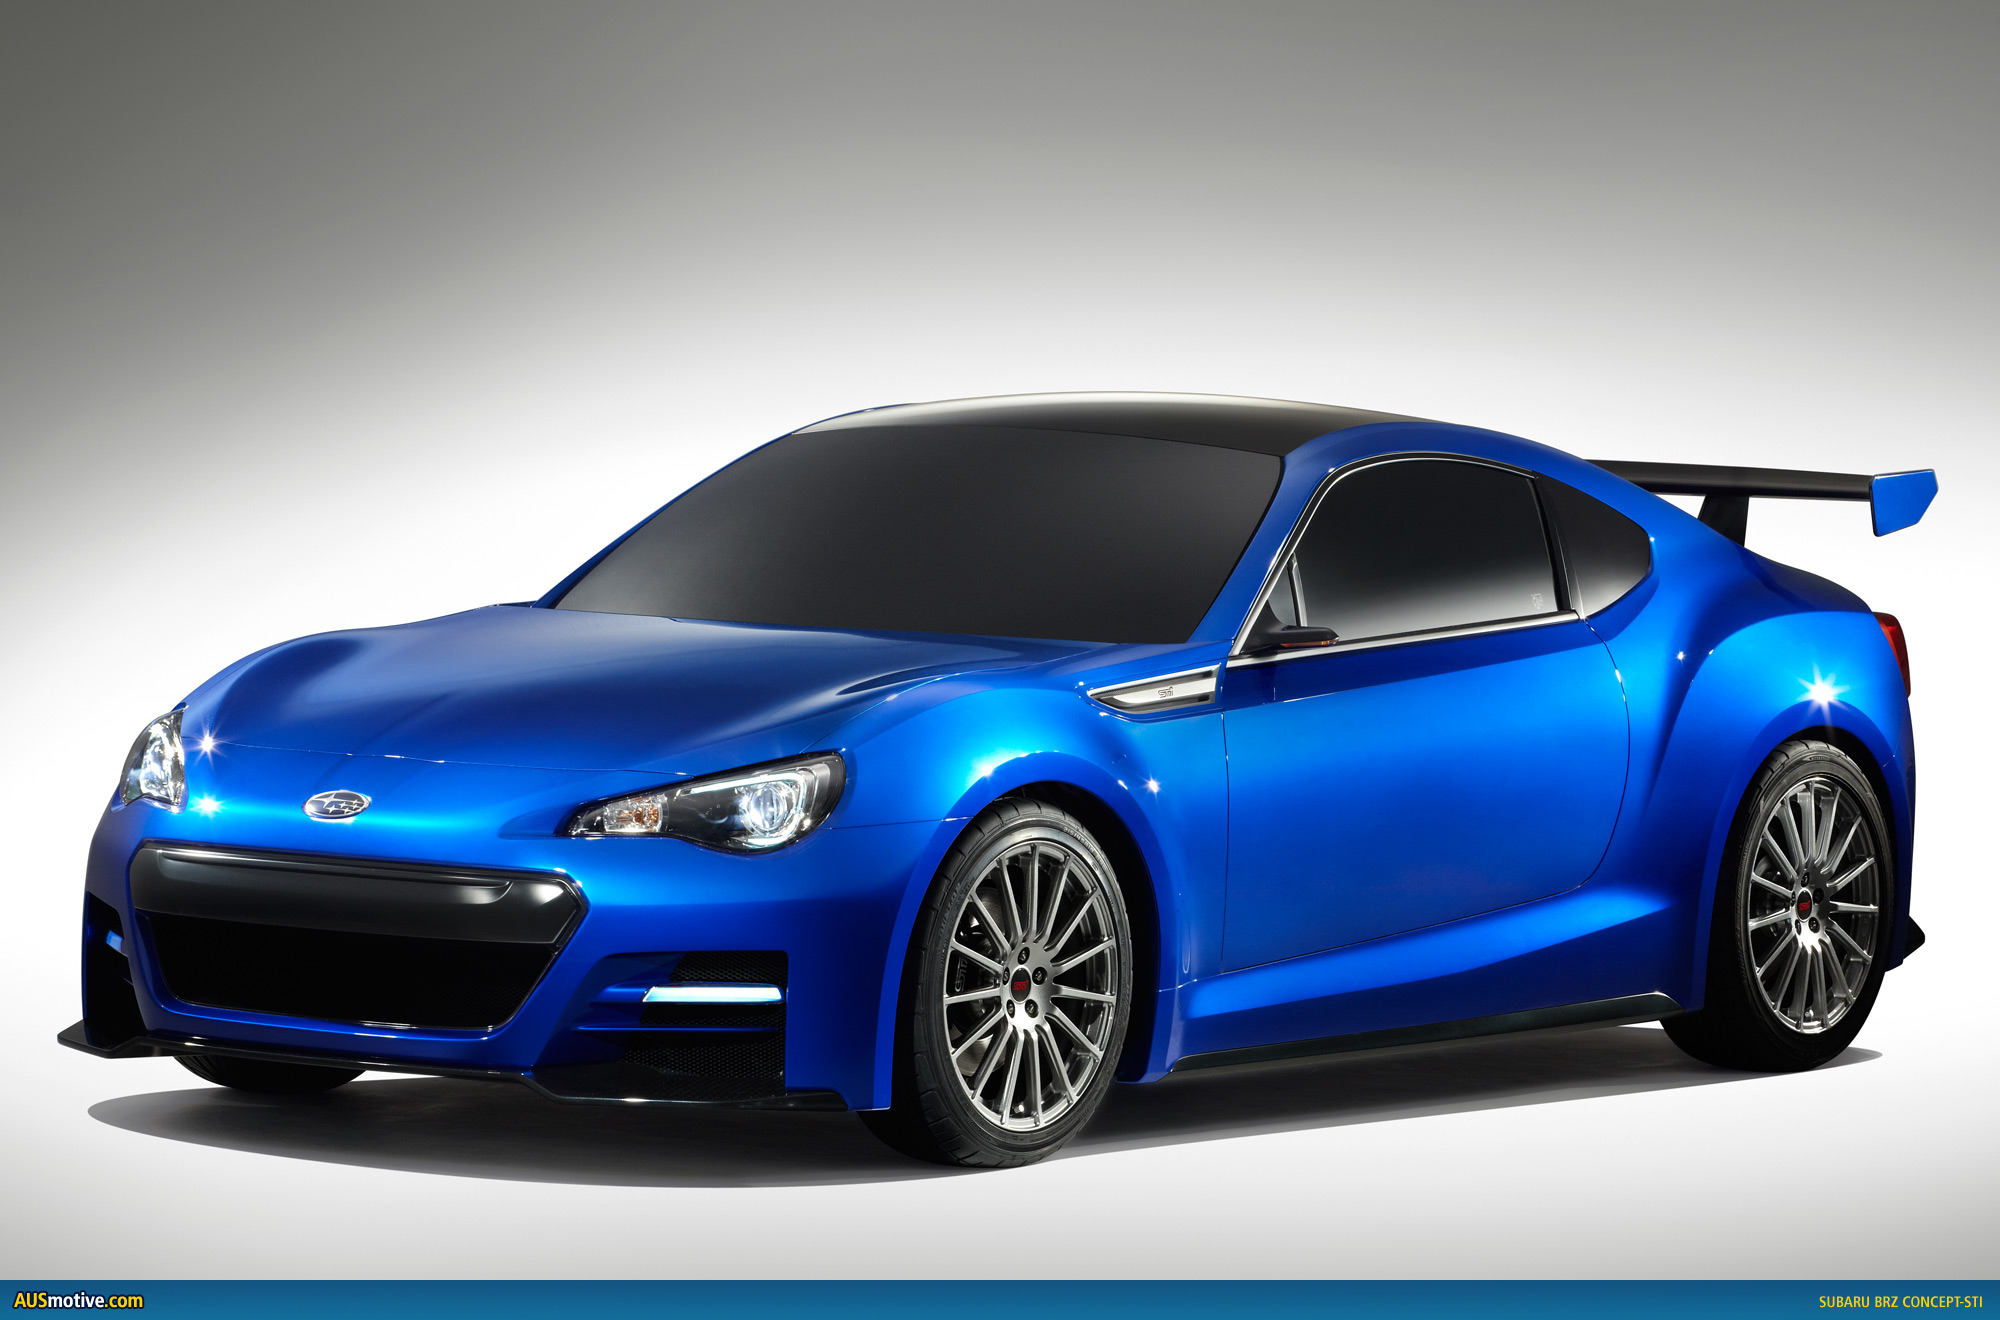 Ausmotive Com 187 La 2011 Subaru Brz Concept Sti